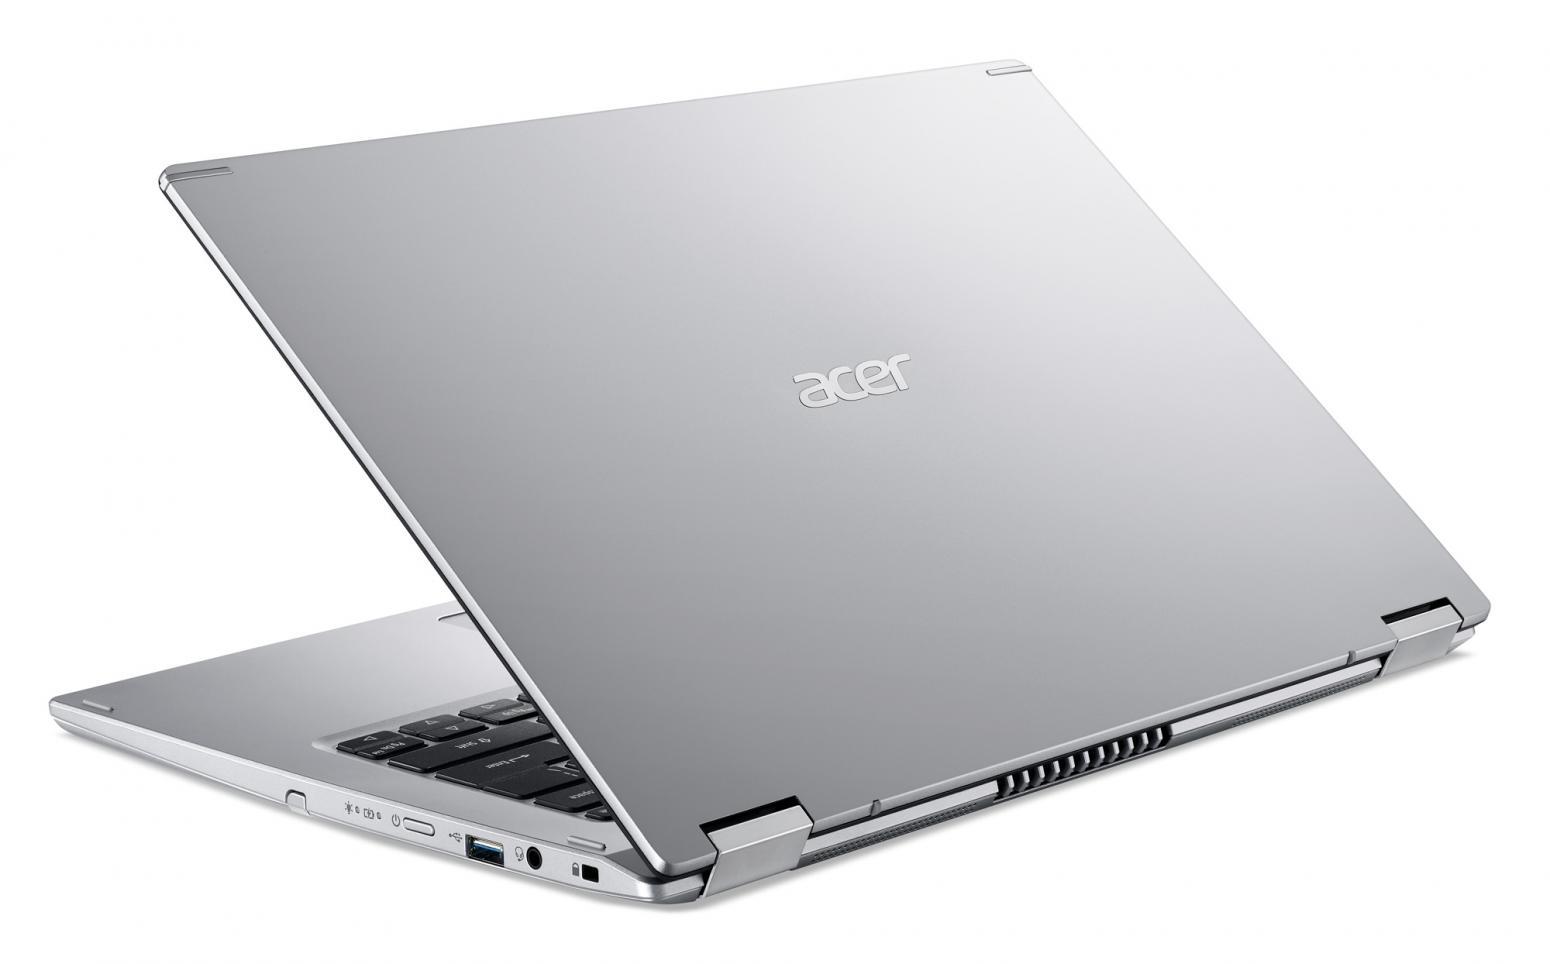 Ordinateur portable Acer Spin 3 SP314-54N-52H9 Argent - Tactile, Stylet - photo 8